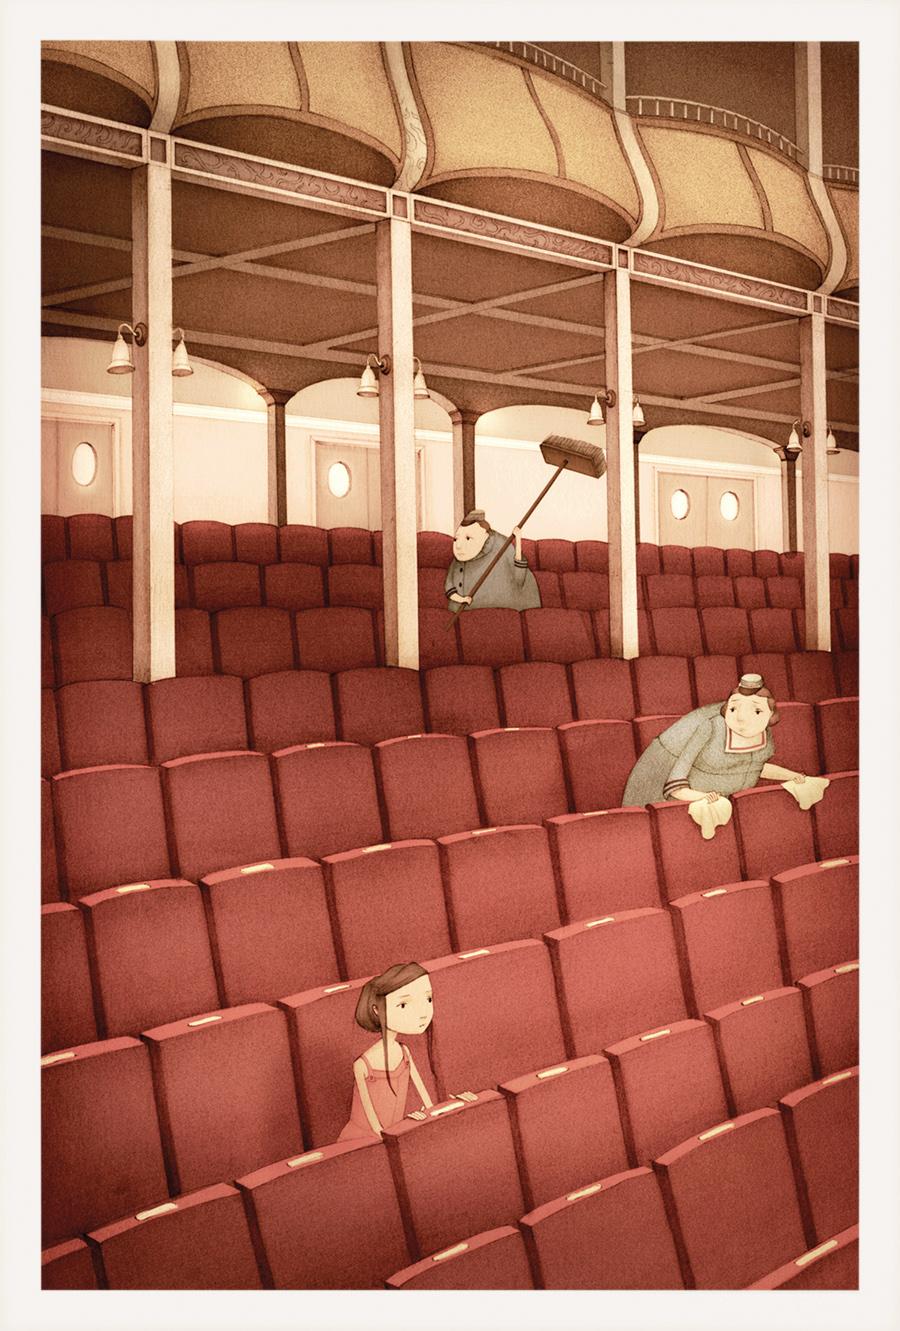 Nicholas Gannon / The Doldrums / Ballet Theater